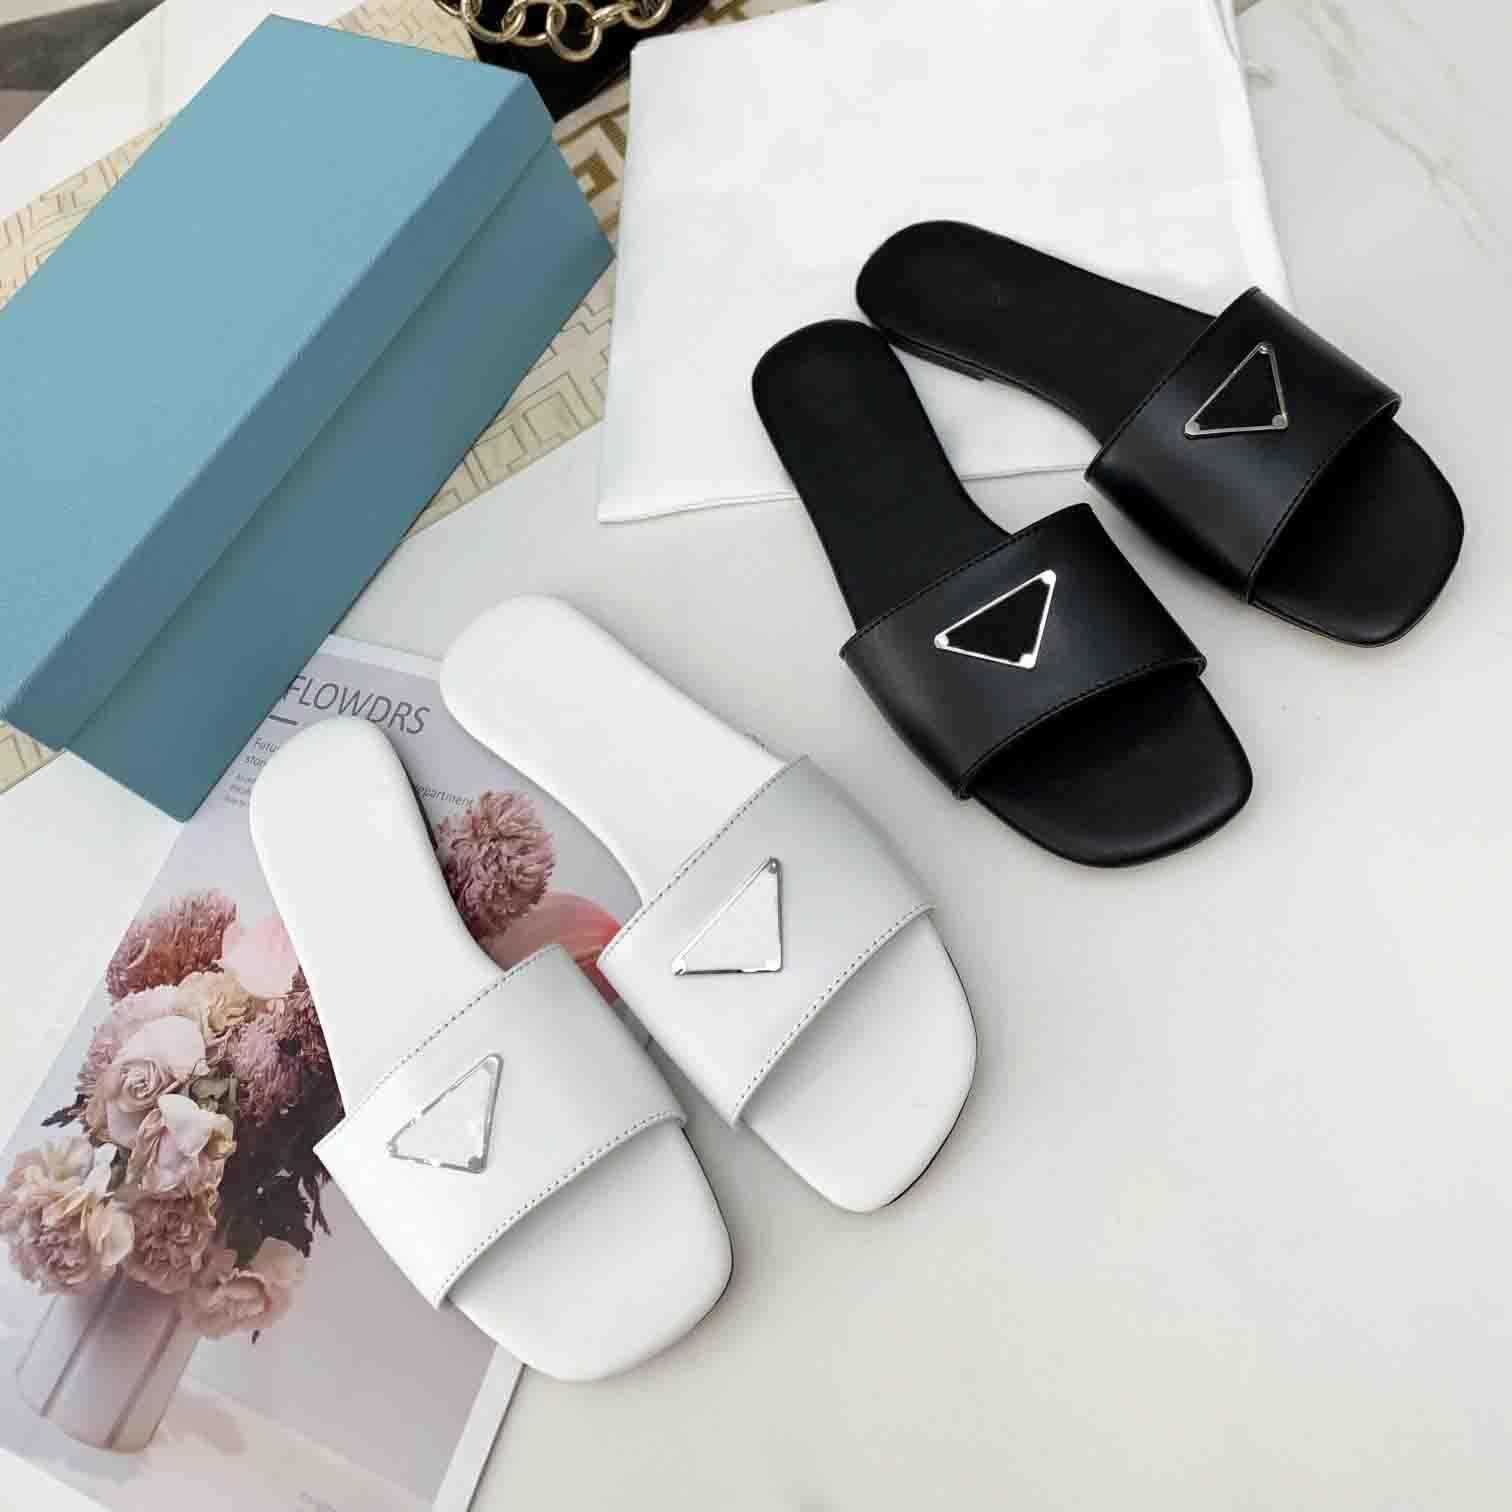 2021 Nuevas sandalias de mujer caliente Flor Animales Sandalias de verano Slide Summer Fashion Wide Flat Slippery Sandals Slipper Flower Box